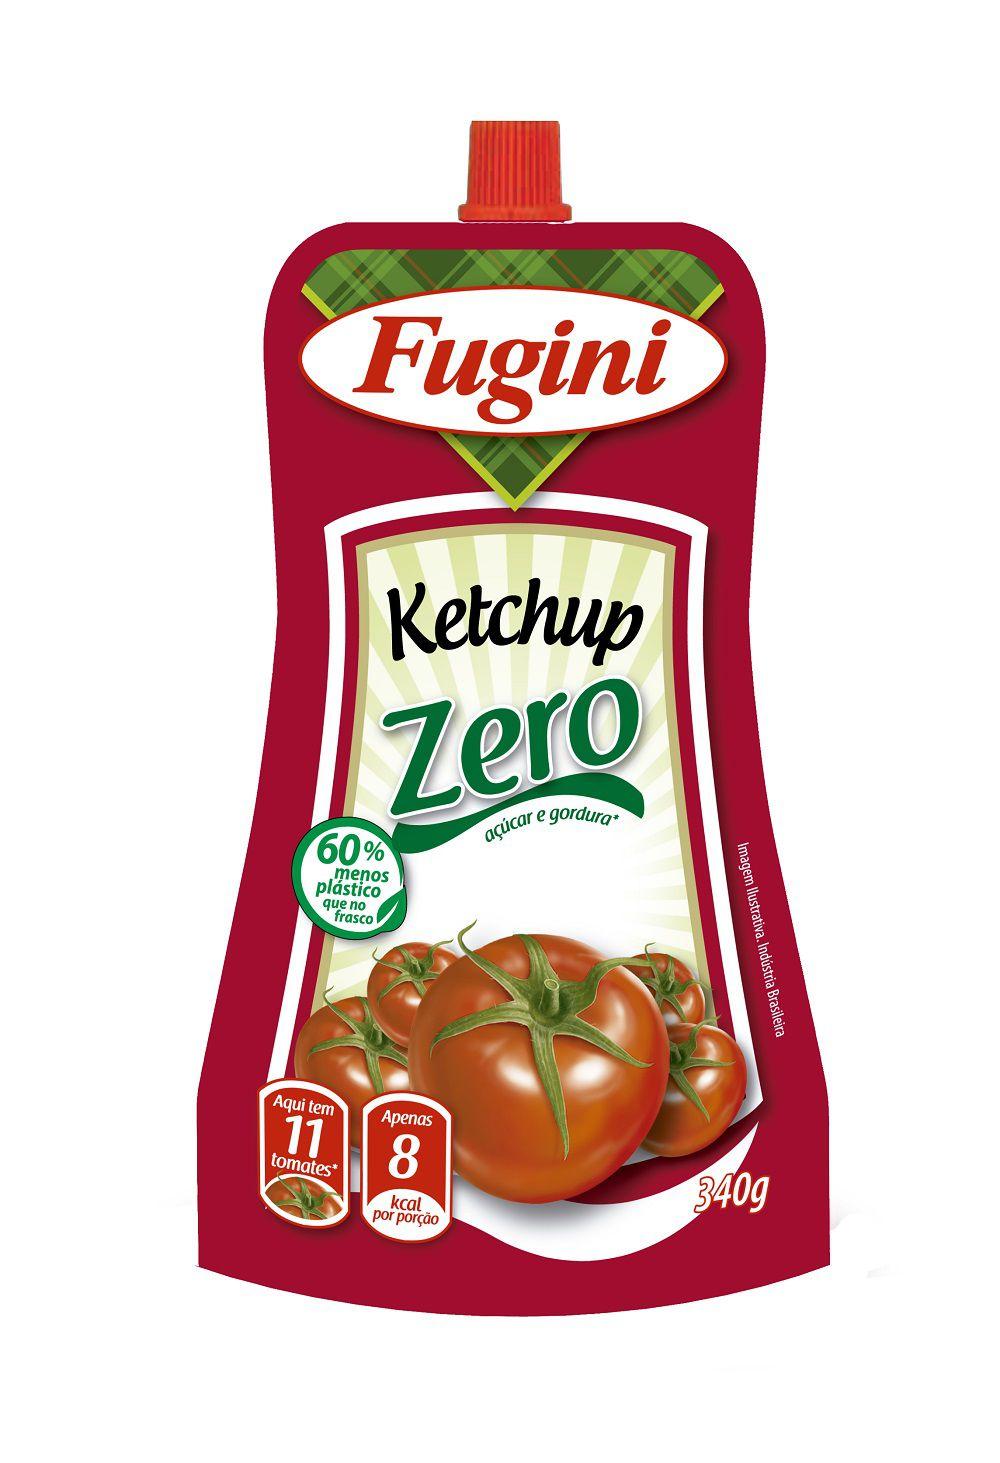 Ketchup Zero Bico 340g Fugini